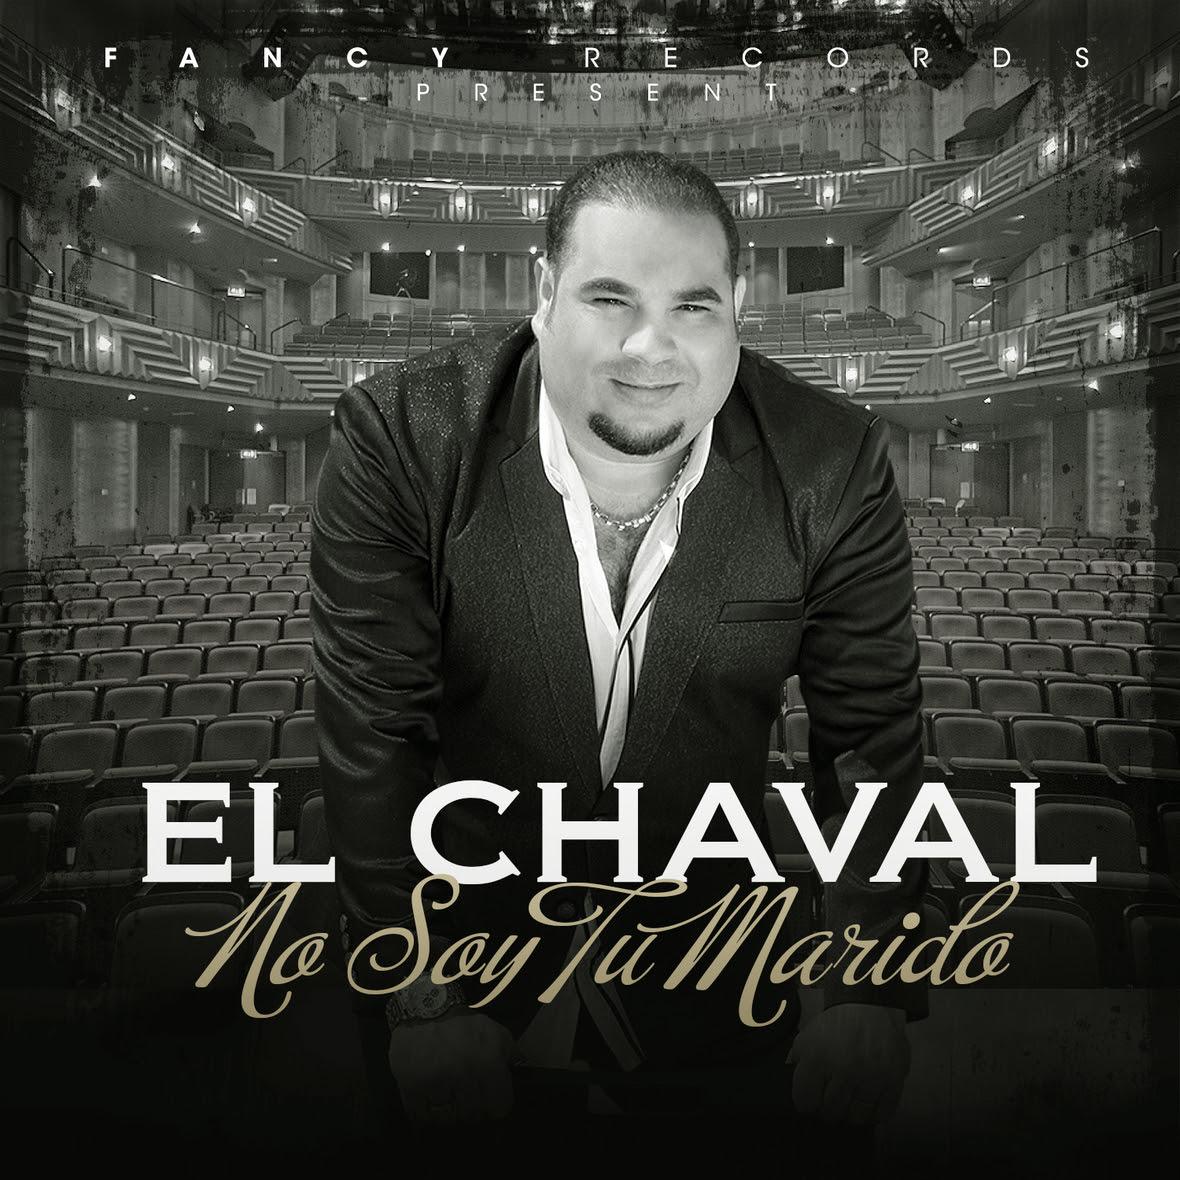 NO SOY TU MARIDO  cd Cover  EL CHAVAL